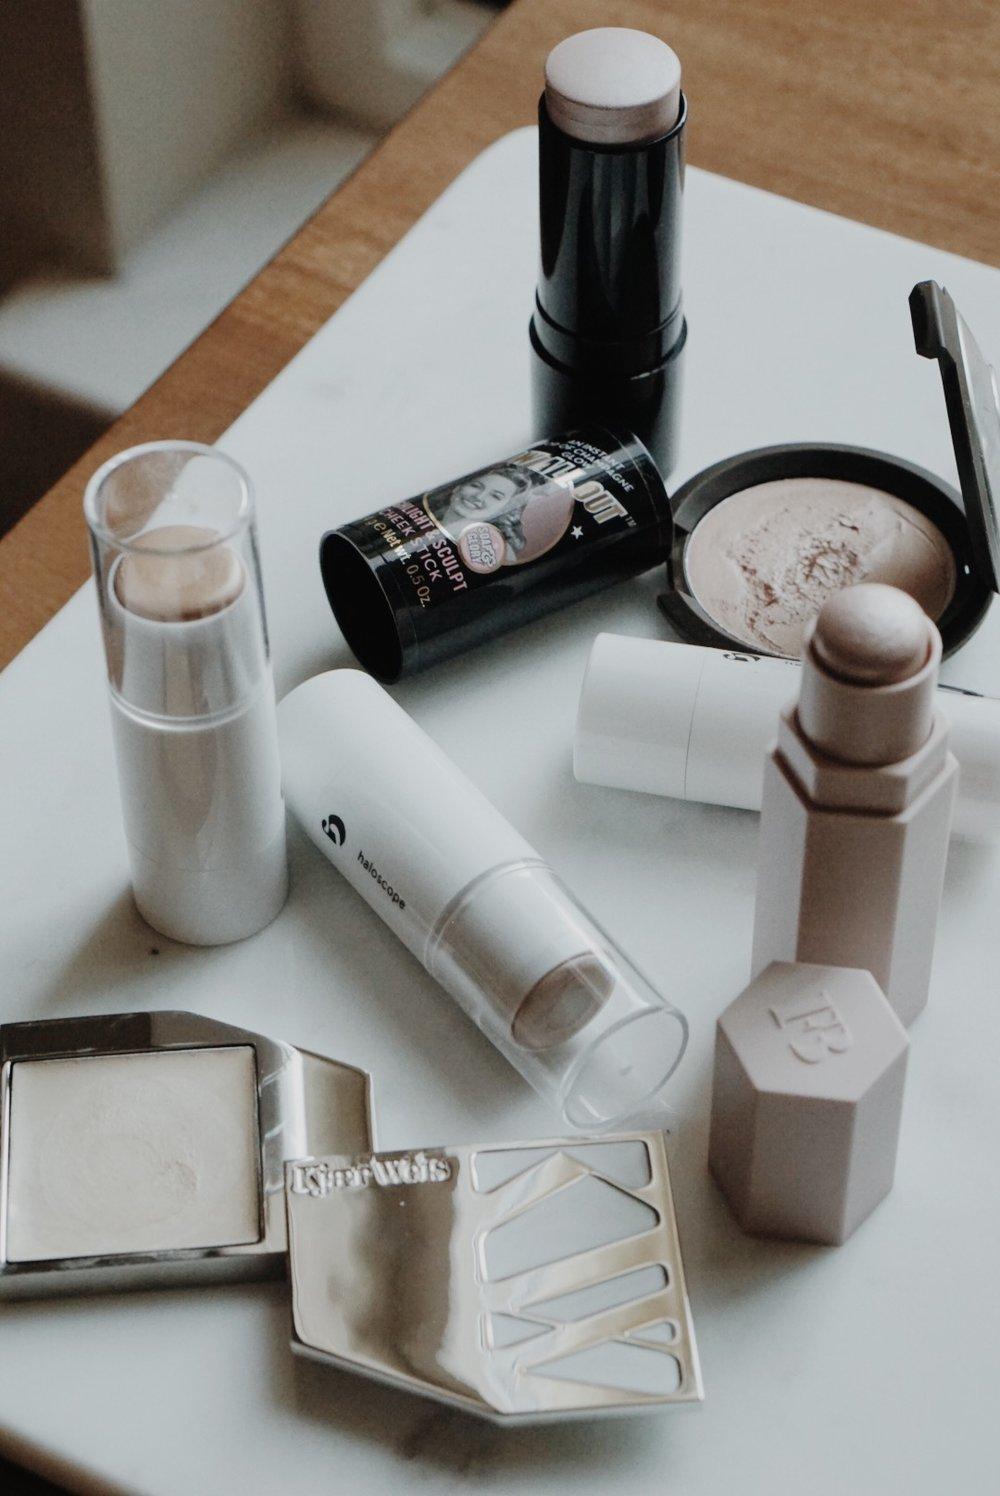 Cream Highlight Roundup: Glossier, Kjaer Weis, Fenty Beauty, BECCA Cosmetics, Soap & Glory